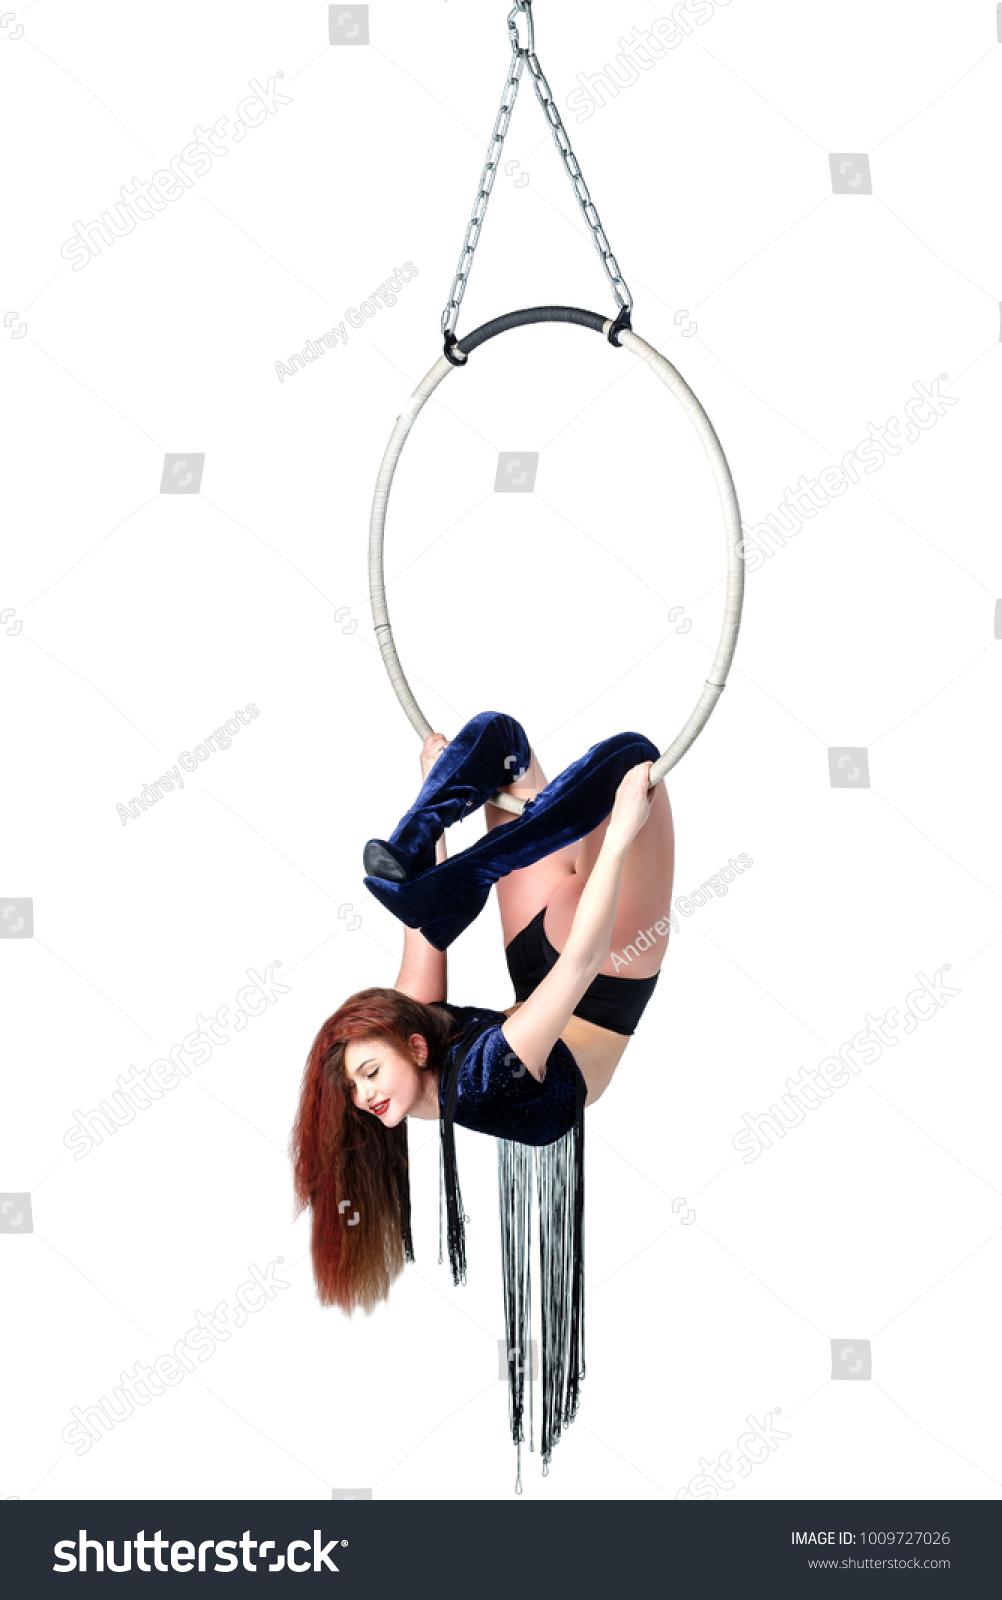 Aerial Acrobat Hoop Beautiful Girl Performs Stock Photo 1009727026 ...